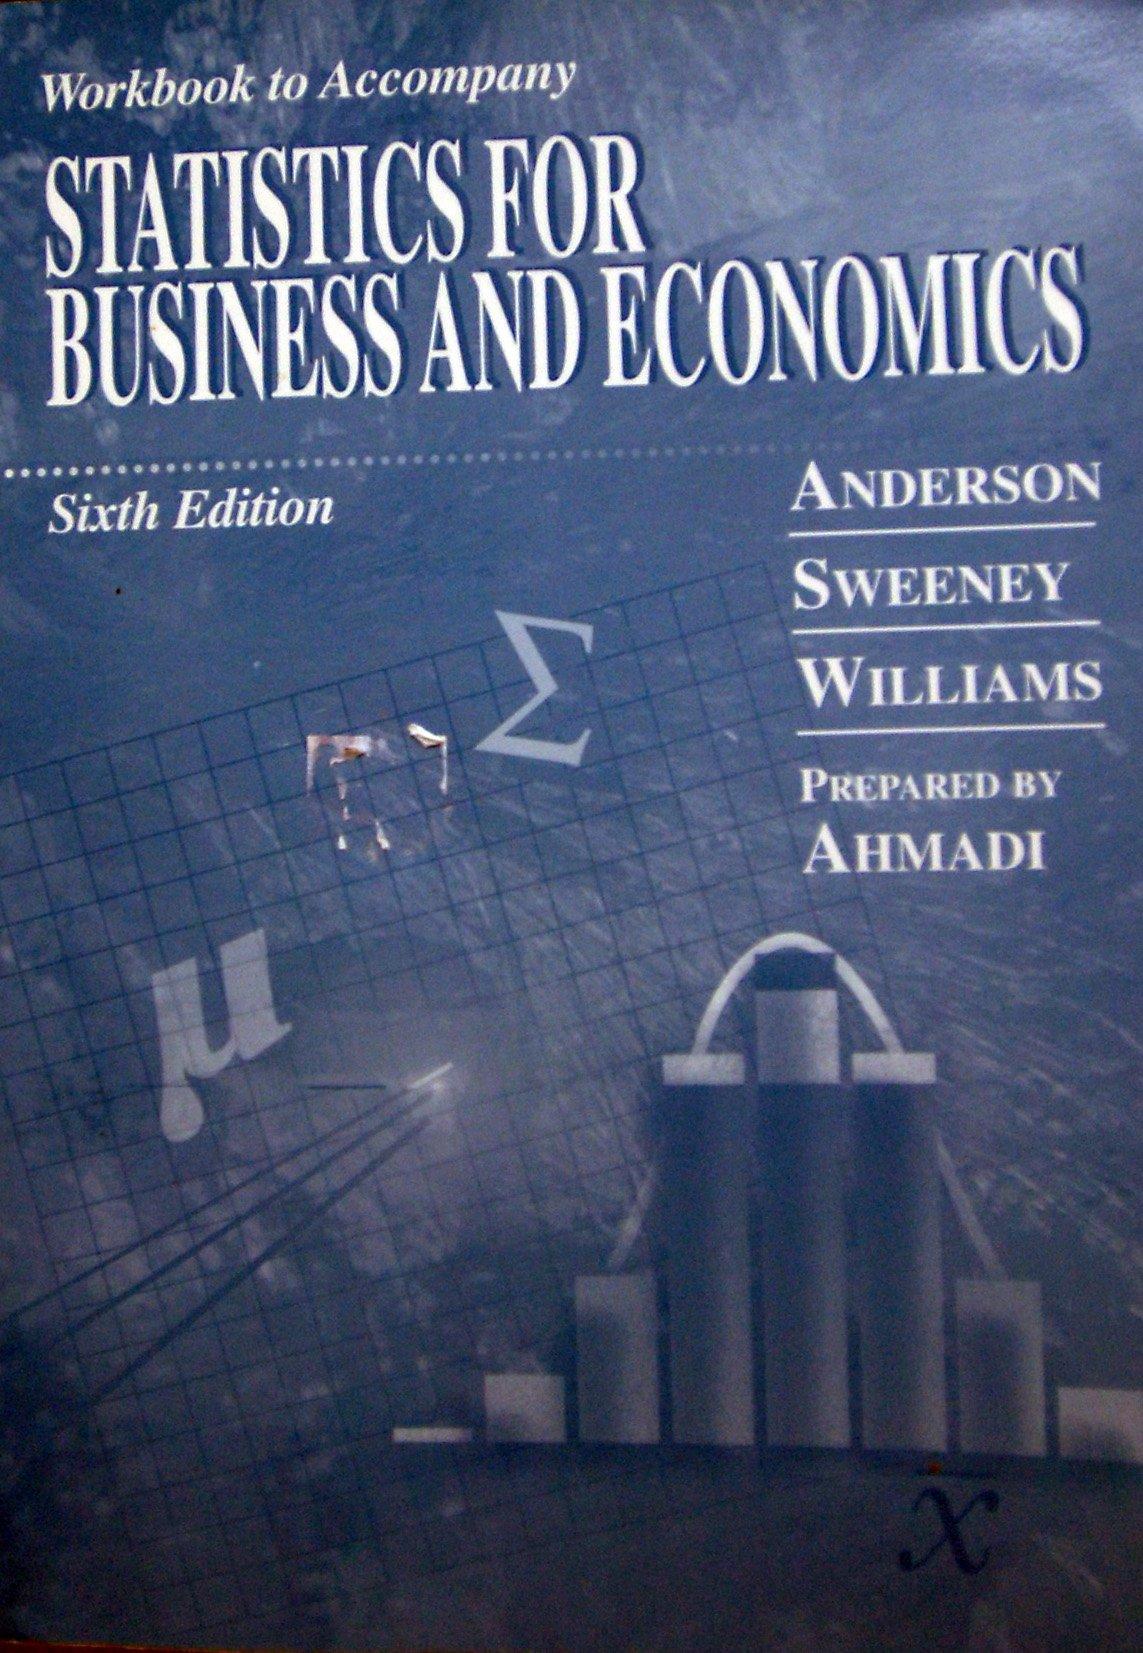 Workbook to Accompany: Statistics for Business and Economics ...